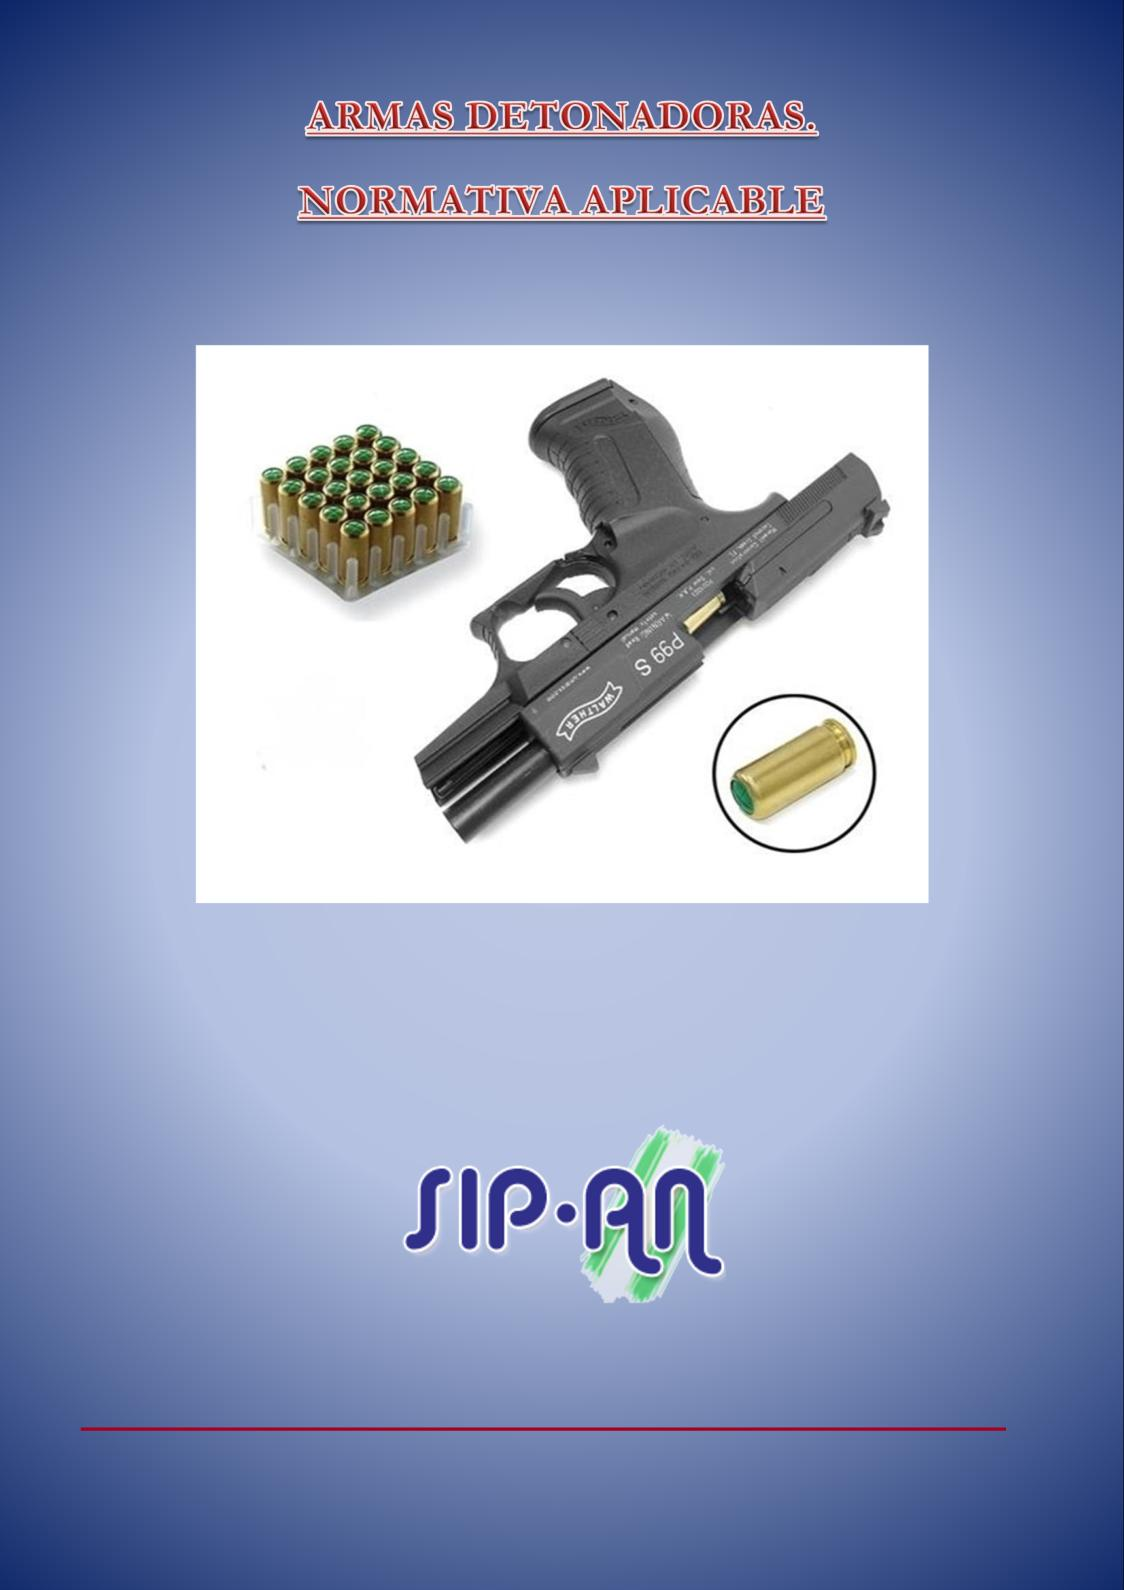 383 Armas Detonadoras